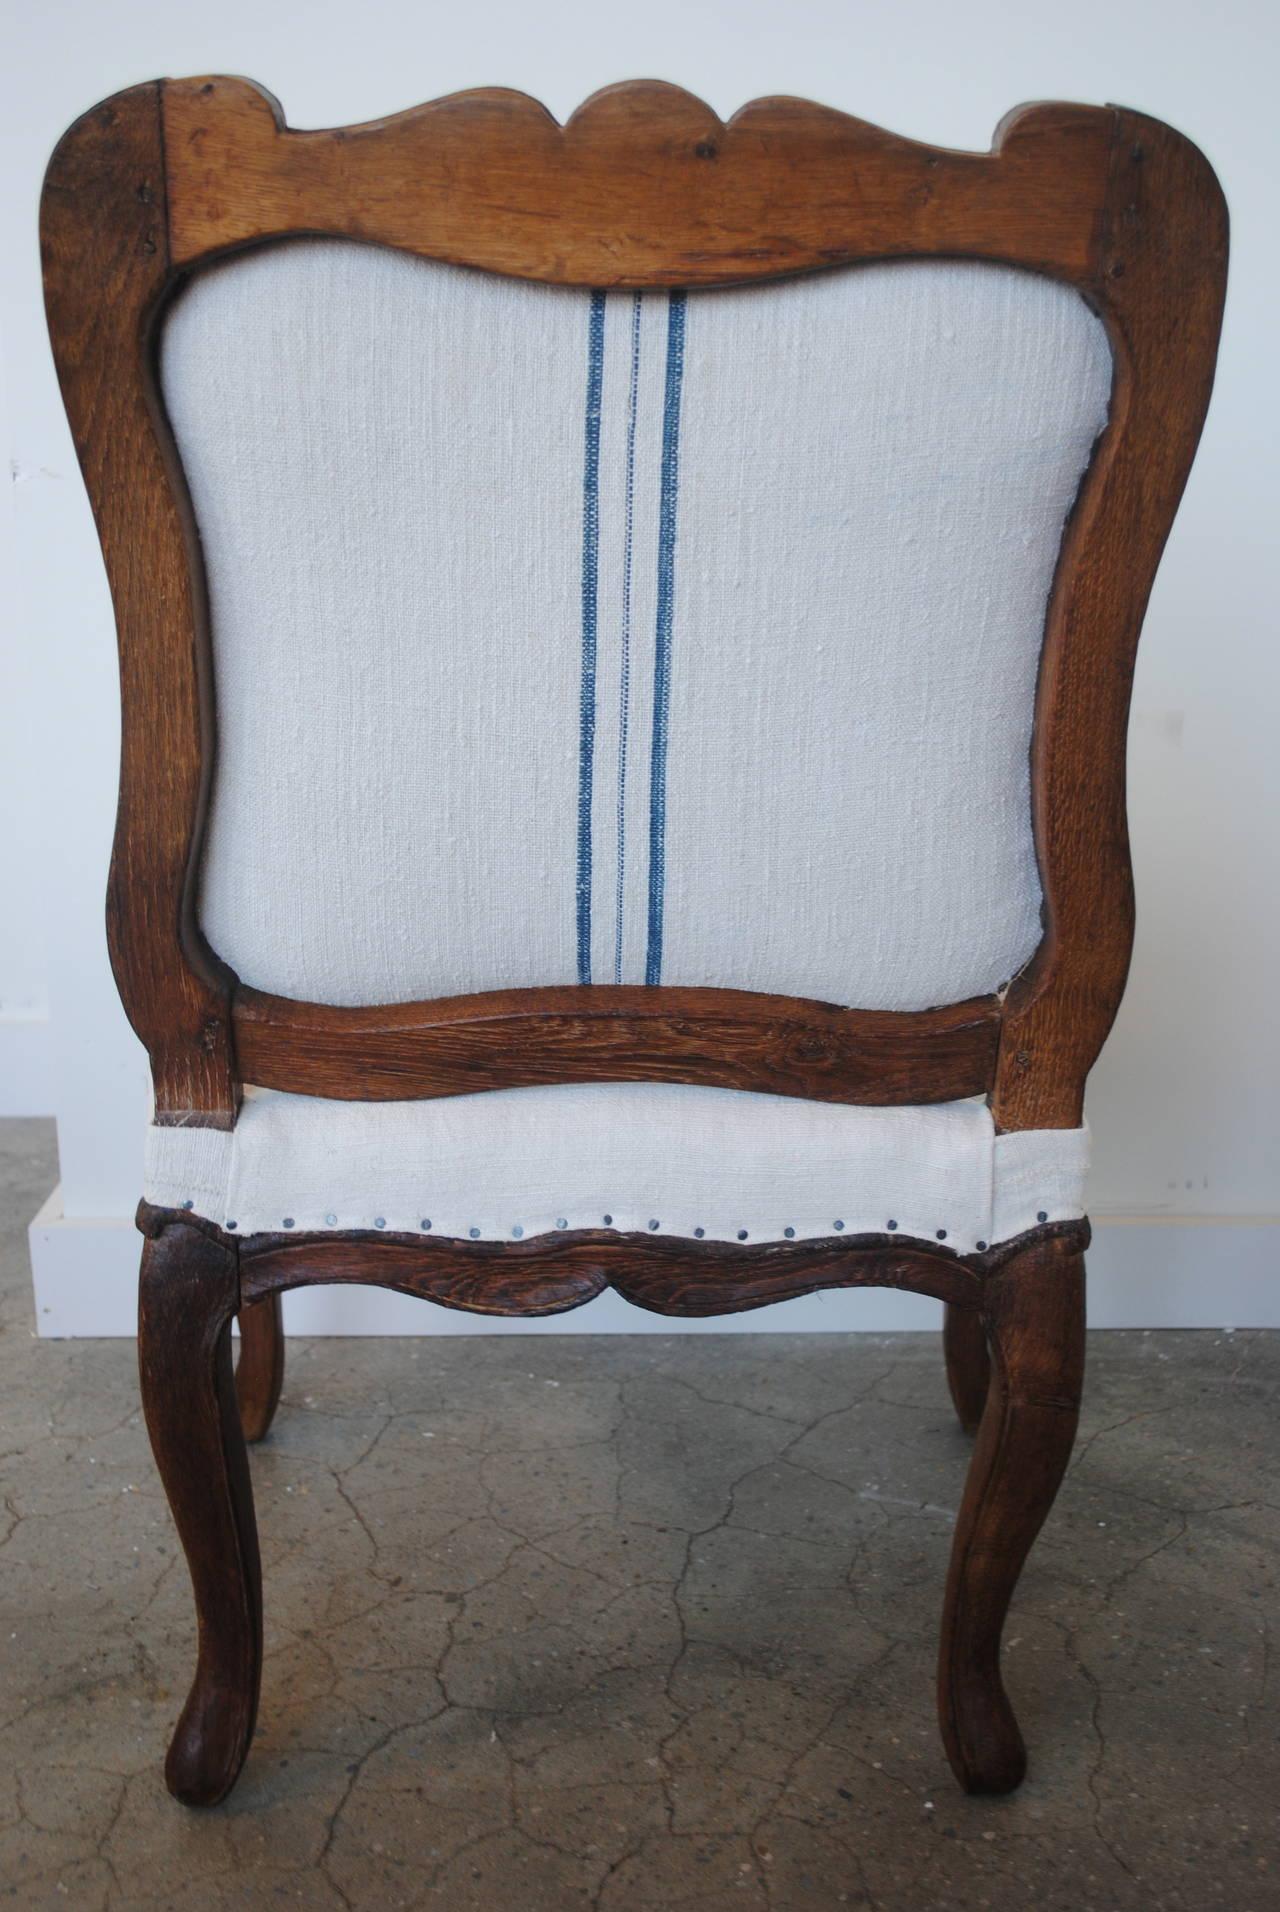 Pair of 19th Century Chestnut Slipper Chairs 6